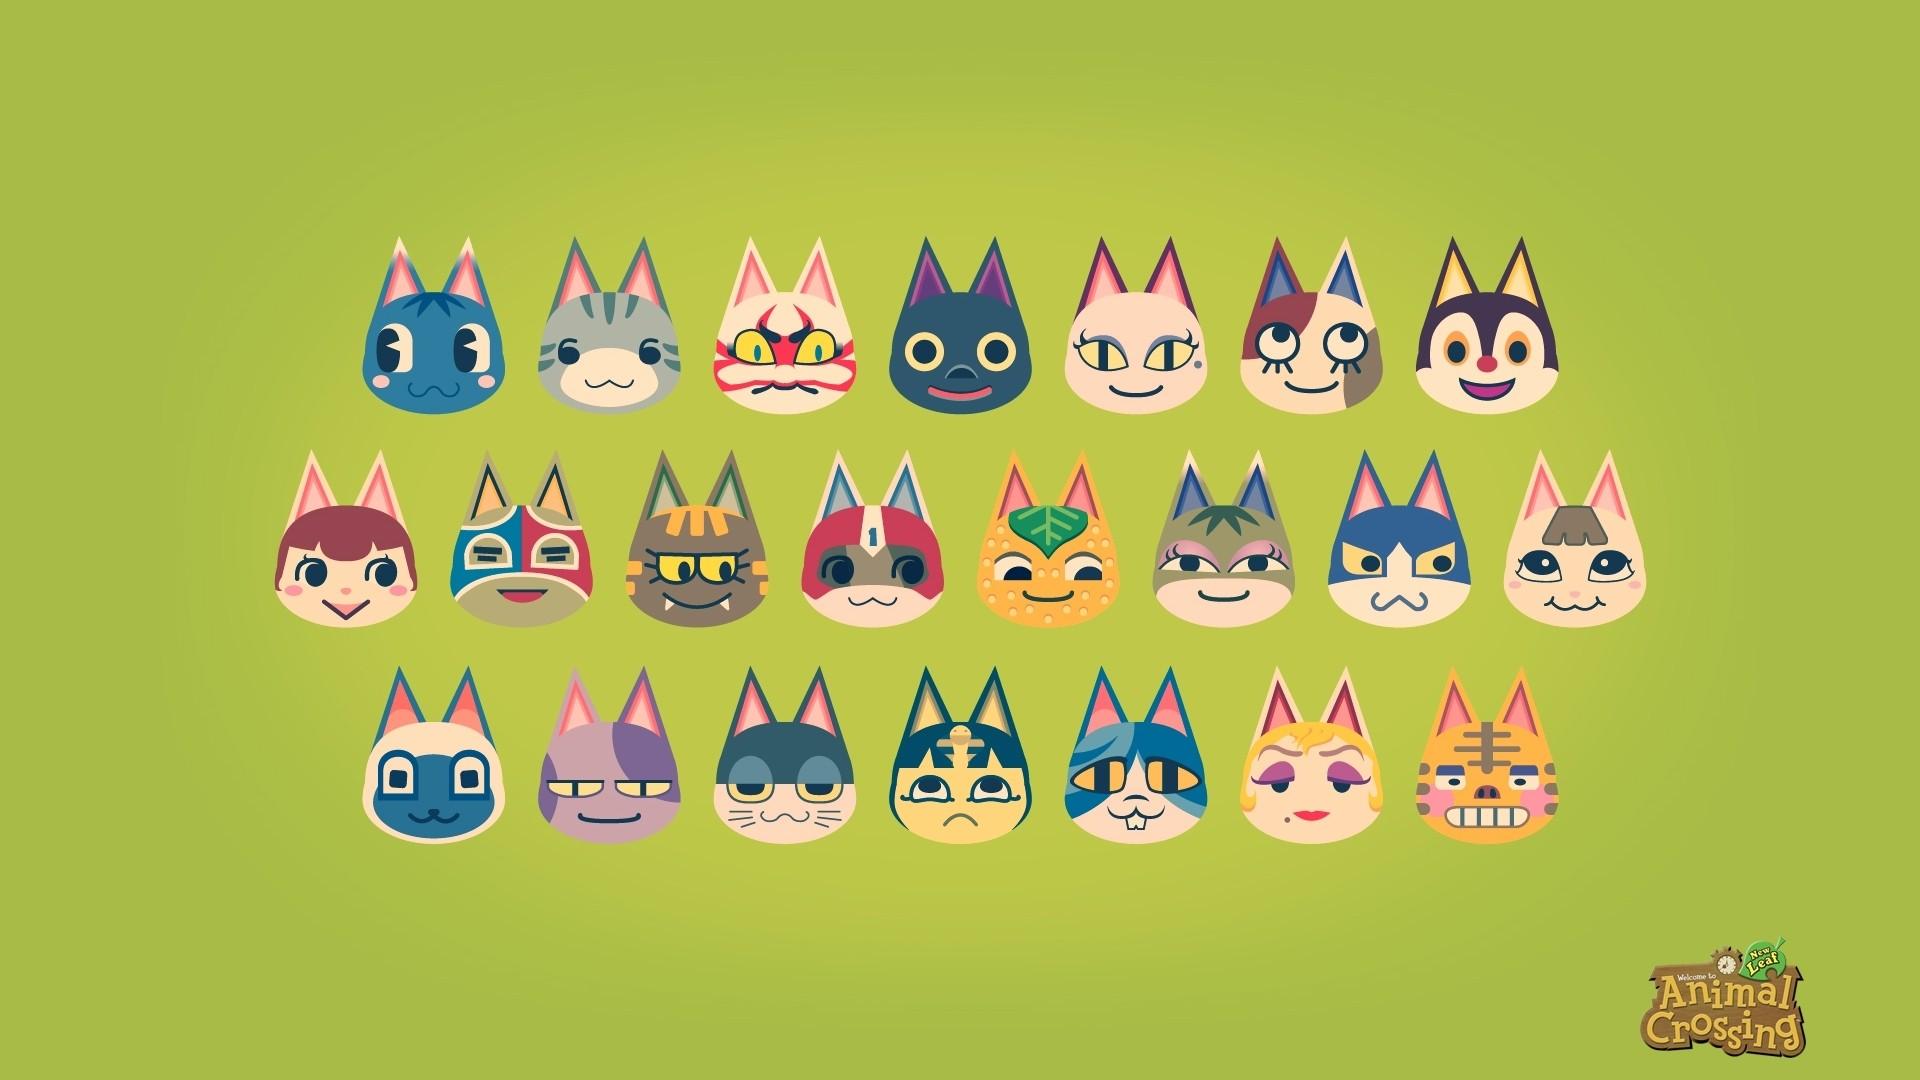 Animal Crossing Wallpaper for pc